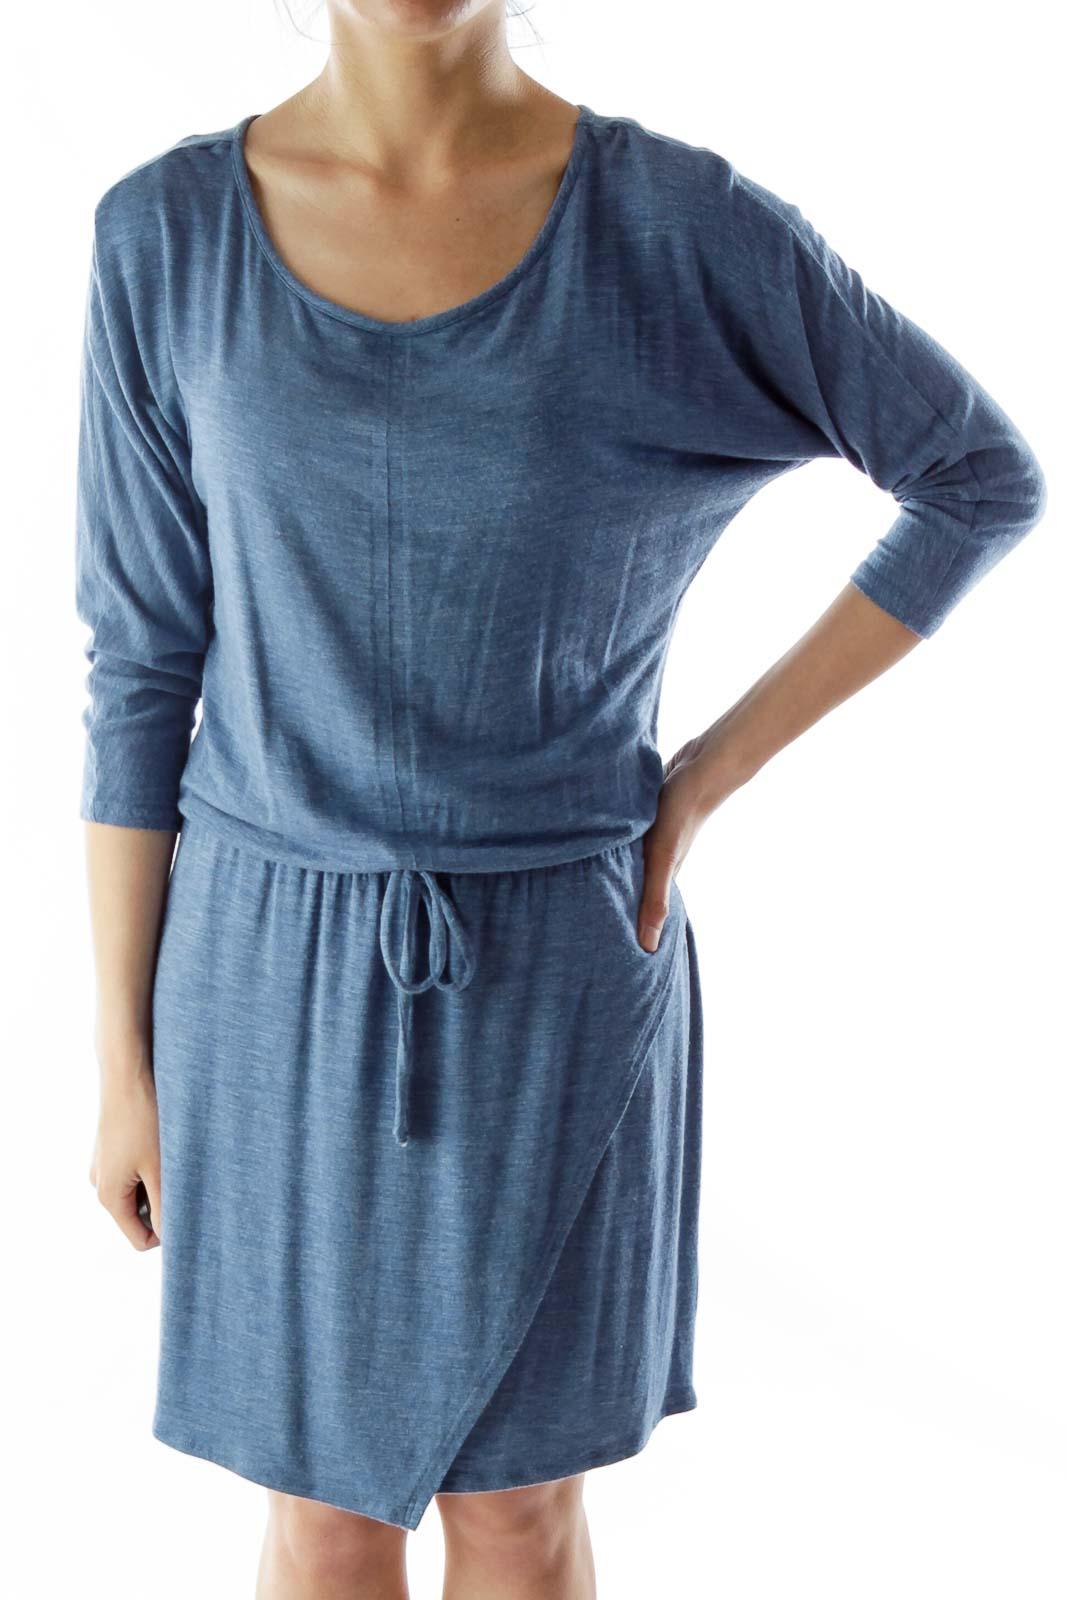 Blue Loose Drawstring Mid-Sleeve Dress